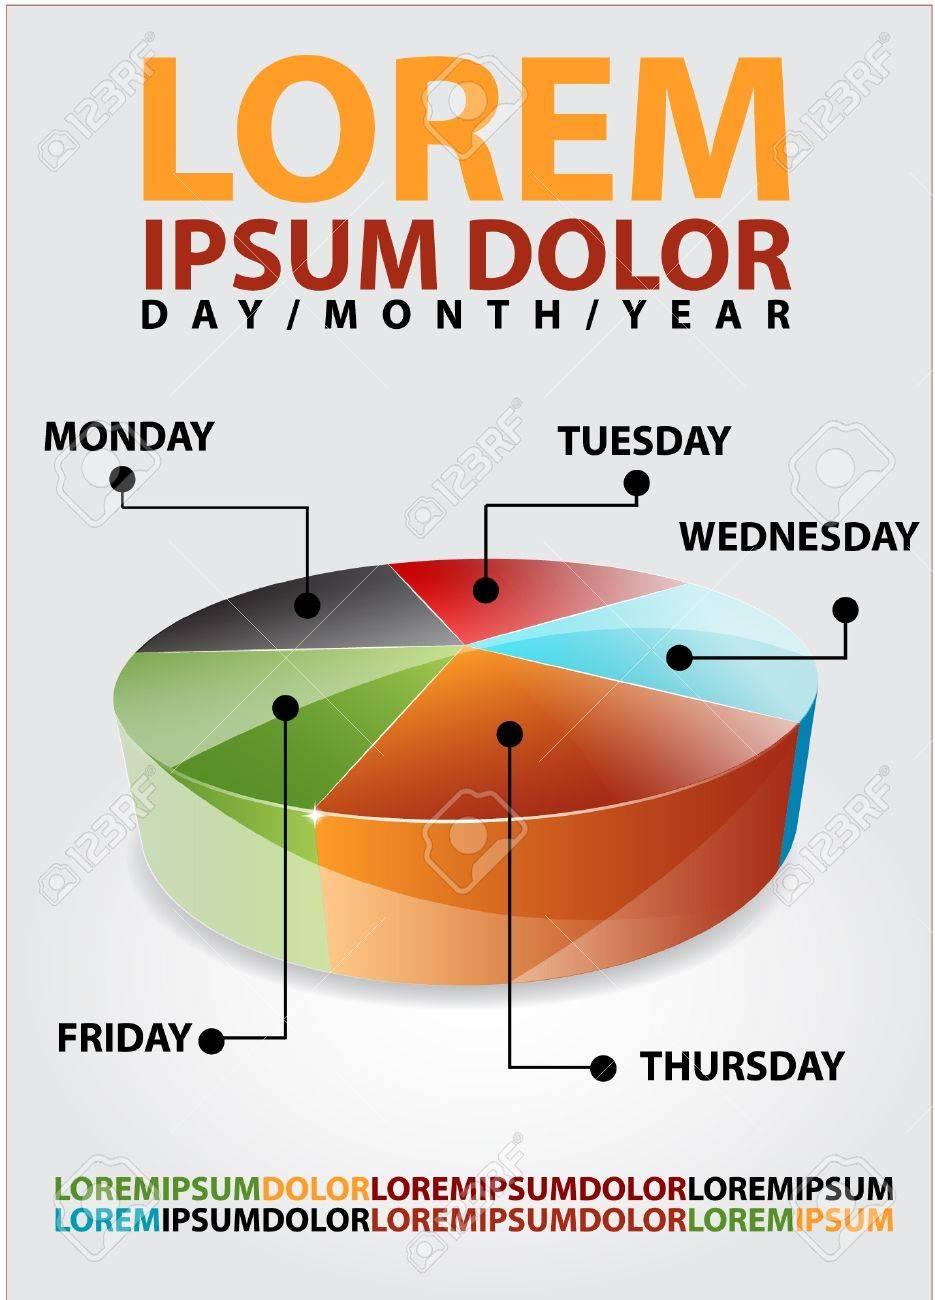 Diagramm backgound Stock Vector - 15164282